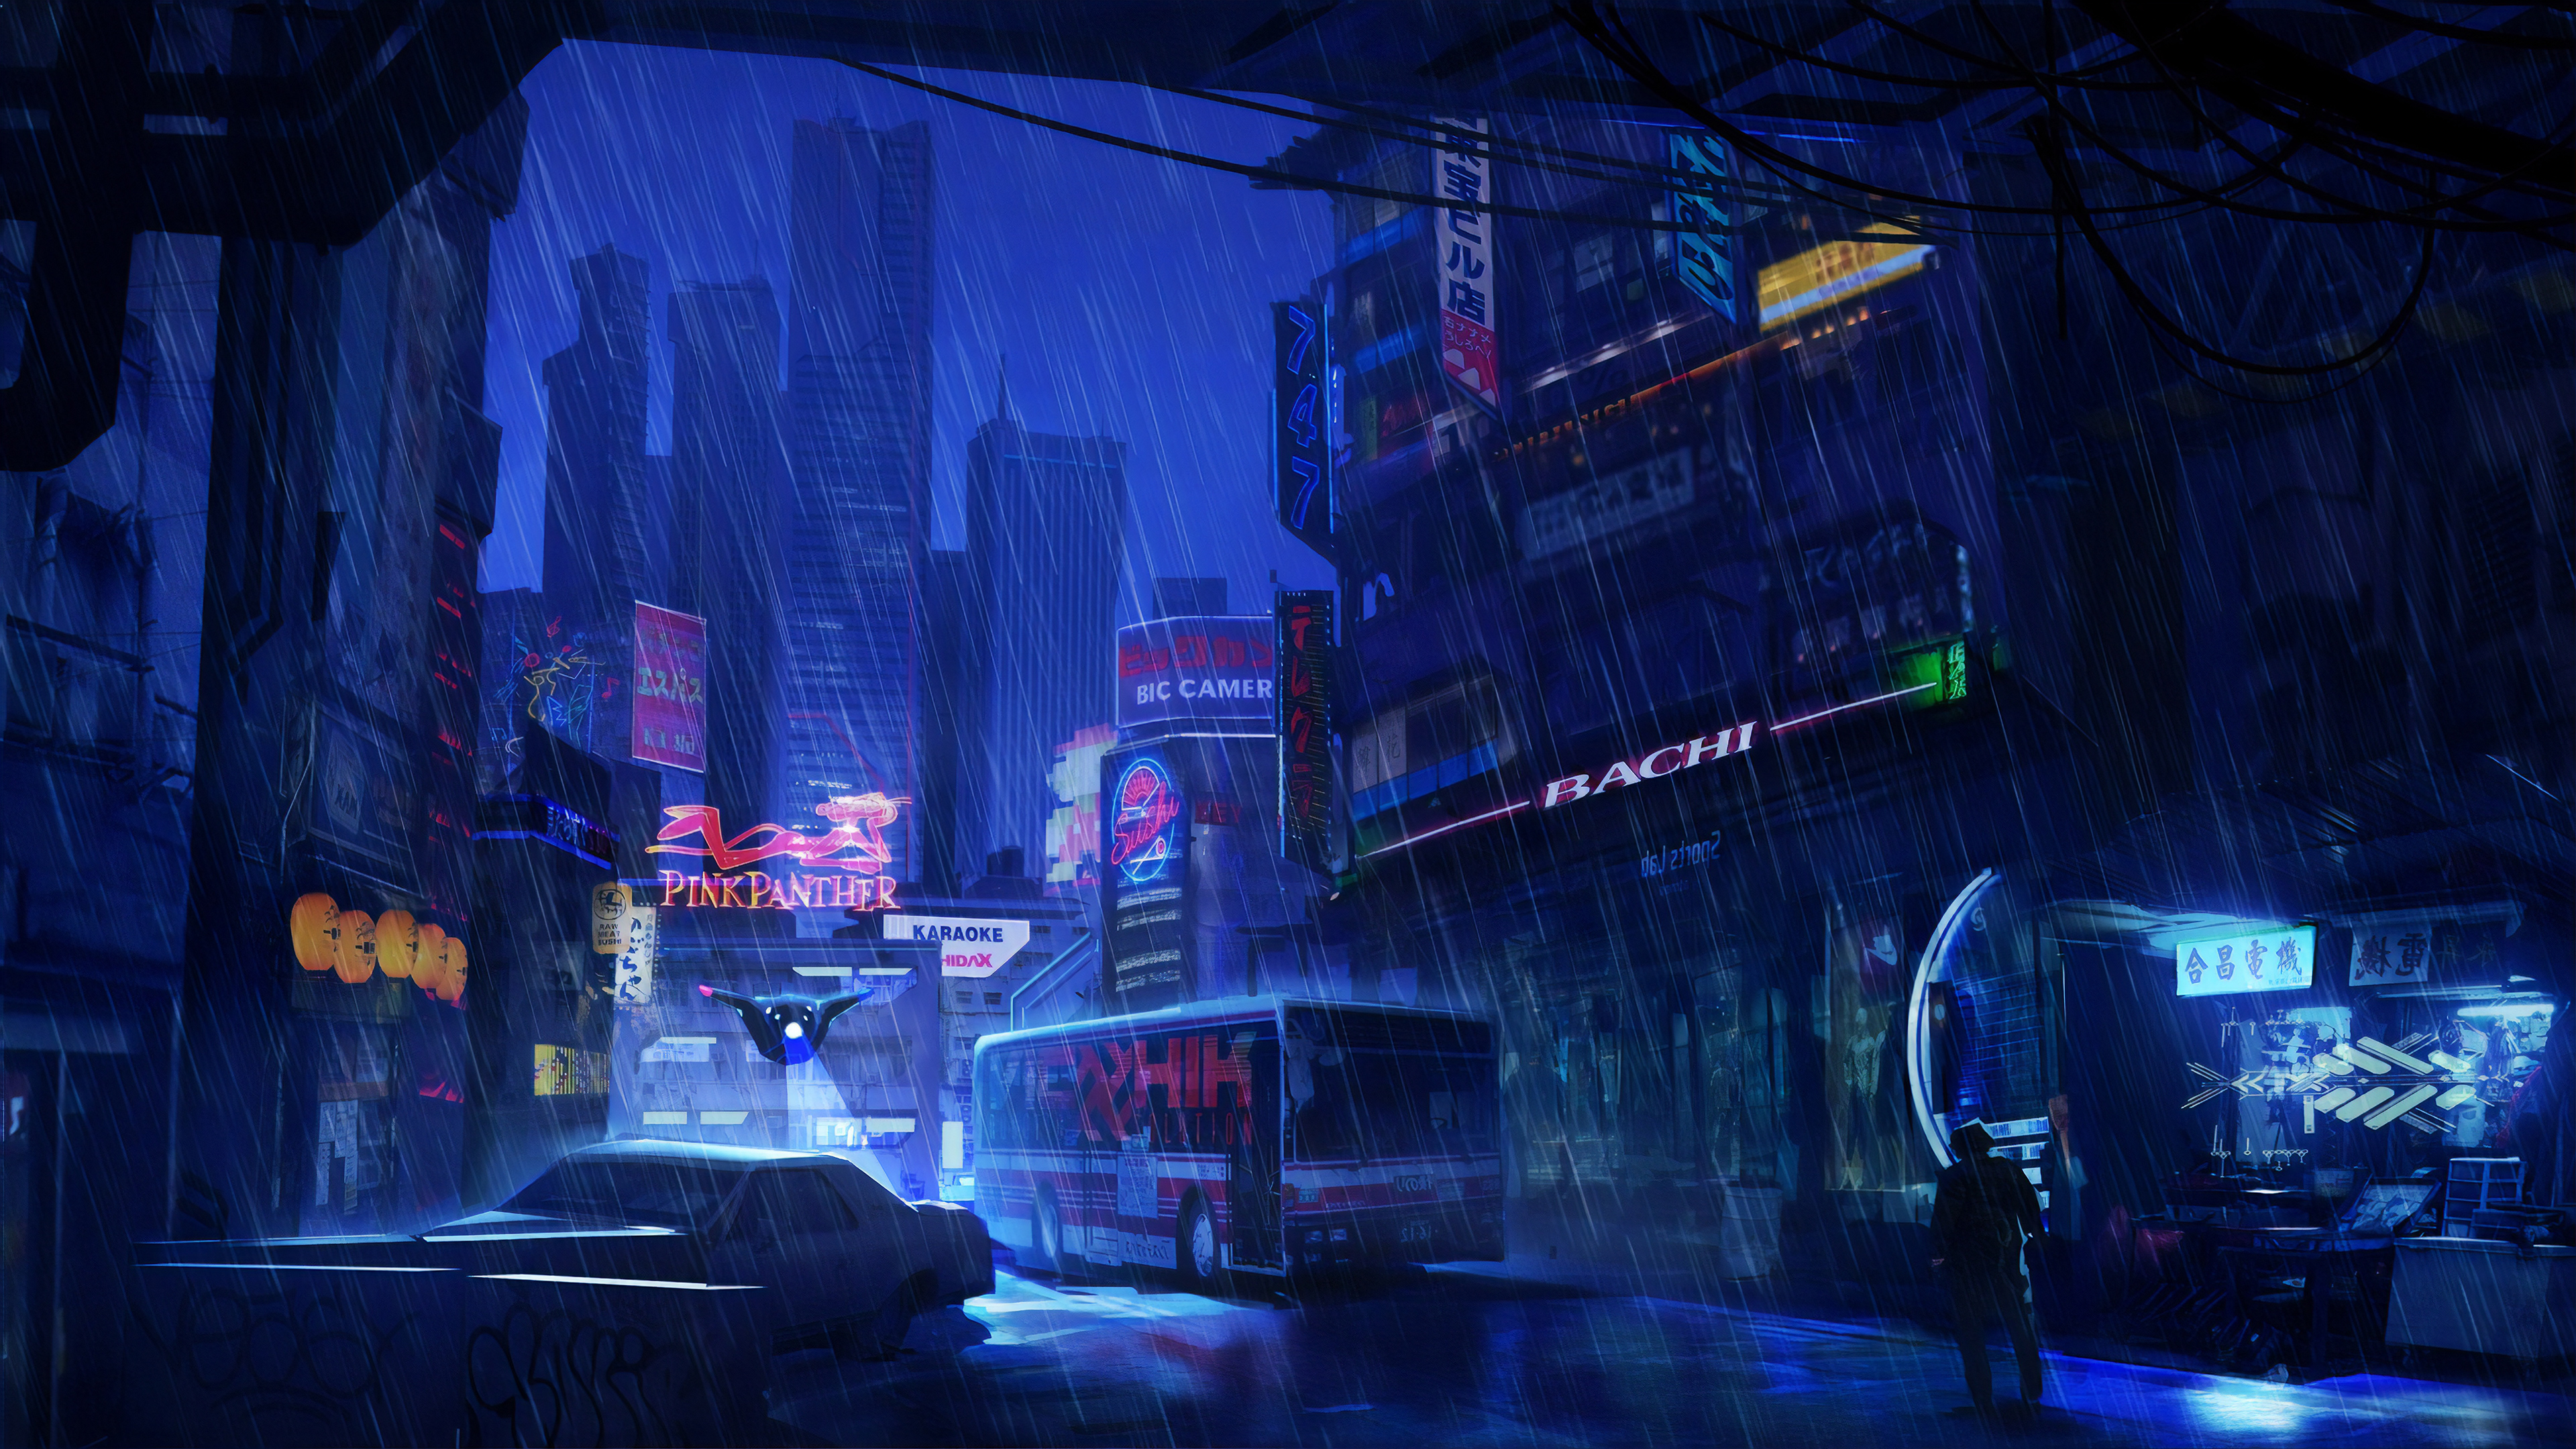 futuristic-city-dark-evening-rain-4k-o8.